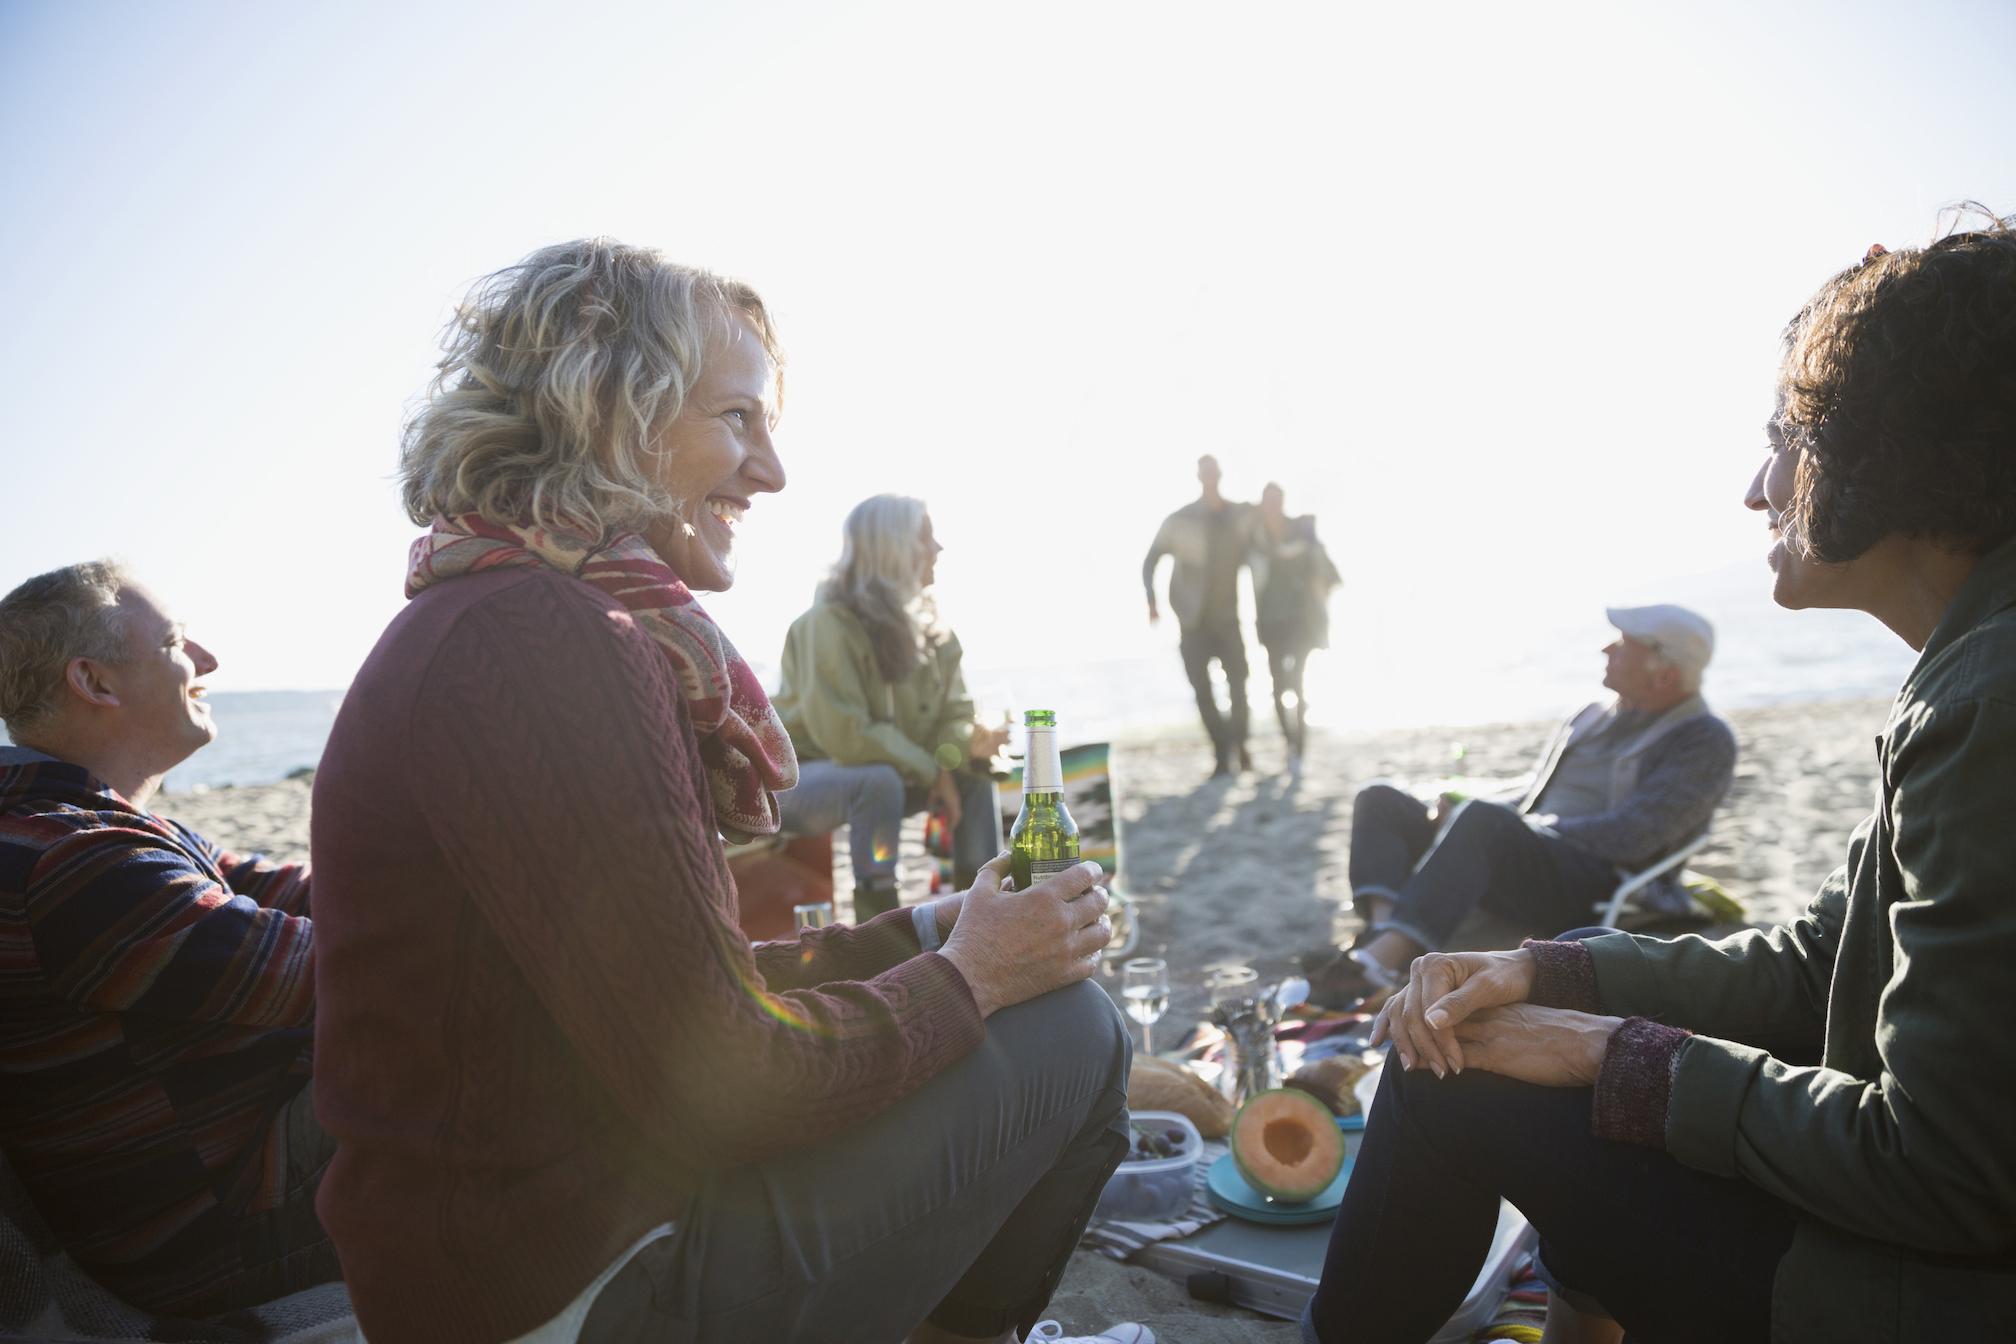 Friends talking and enjoying picnic on sunny beach